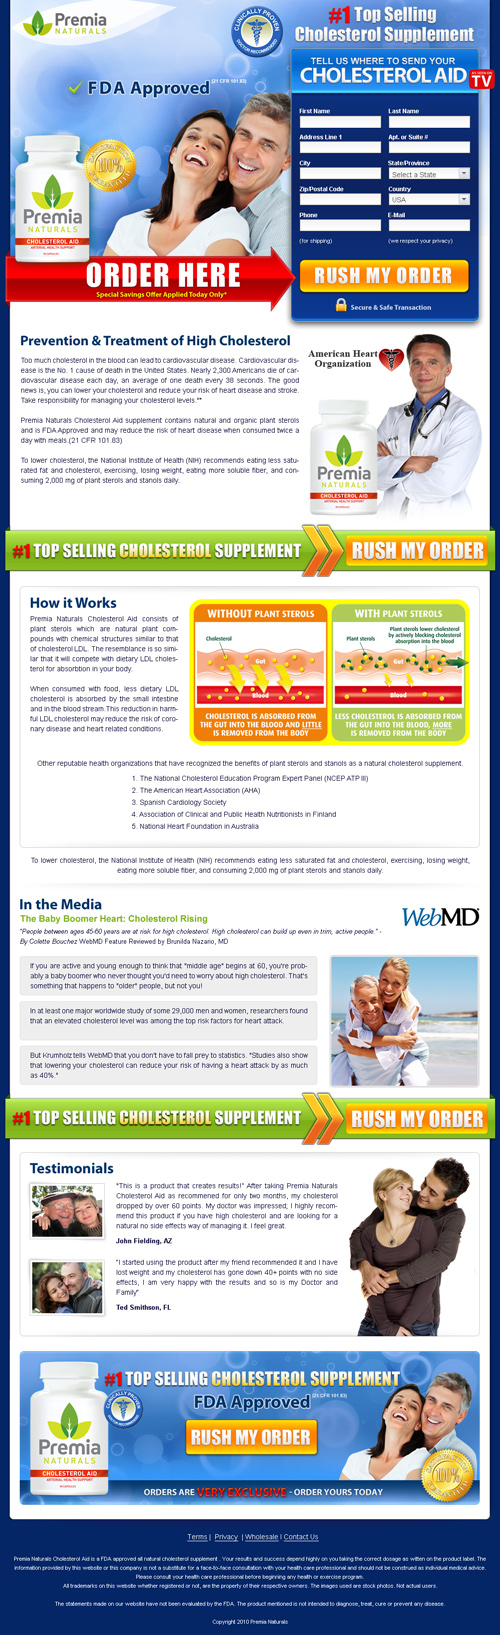 landing-page-design-portfolio-example-006